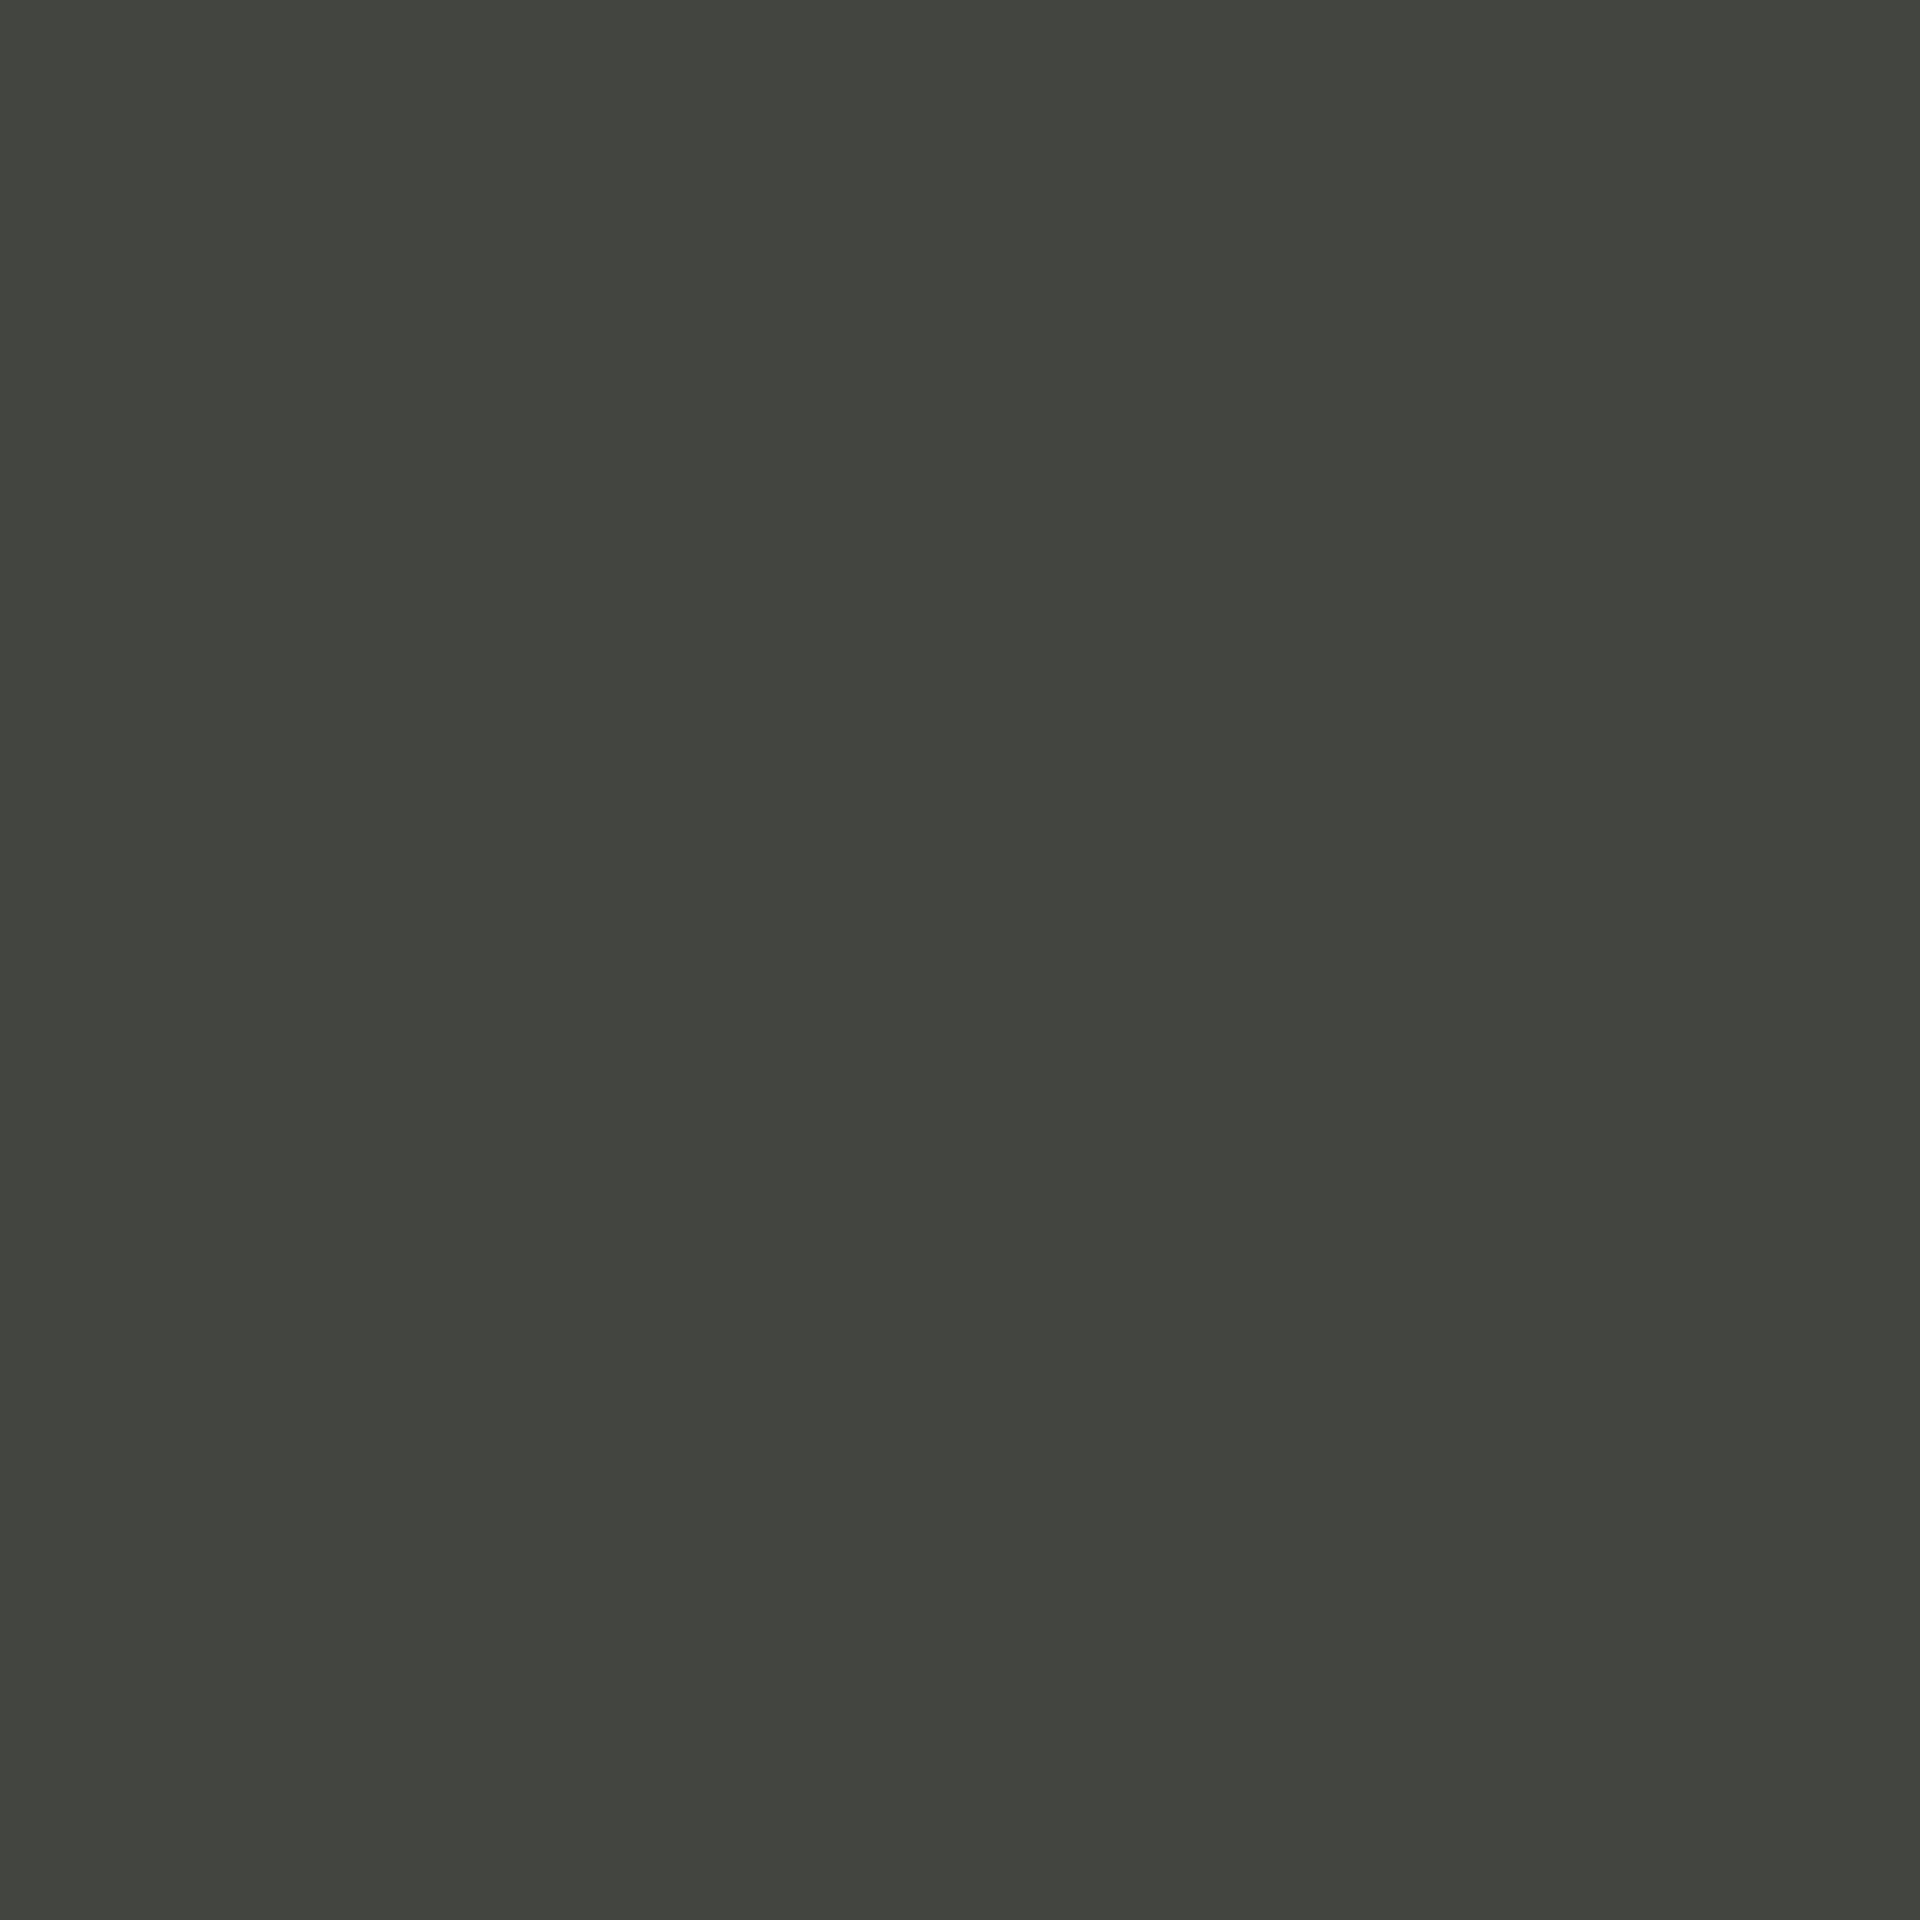 Carrera Grey